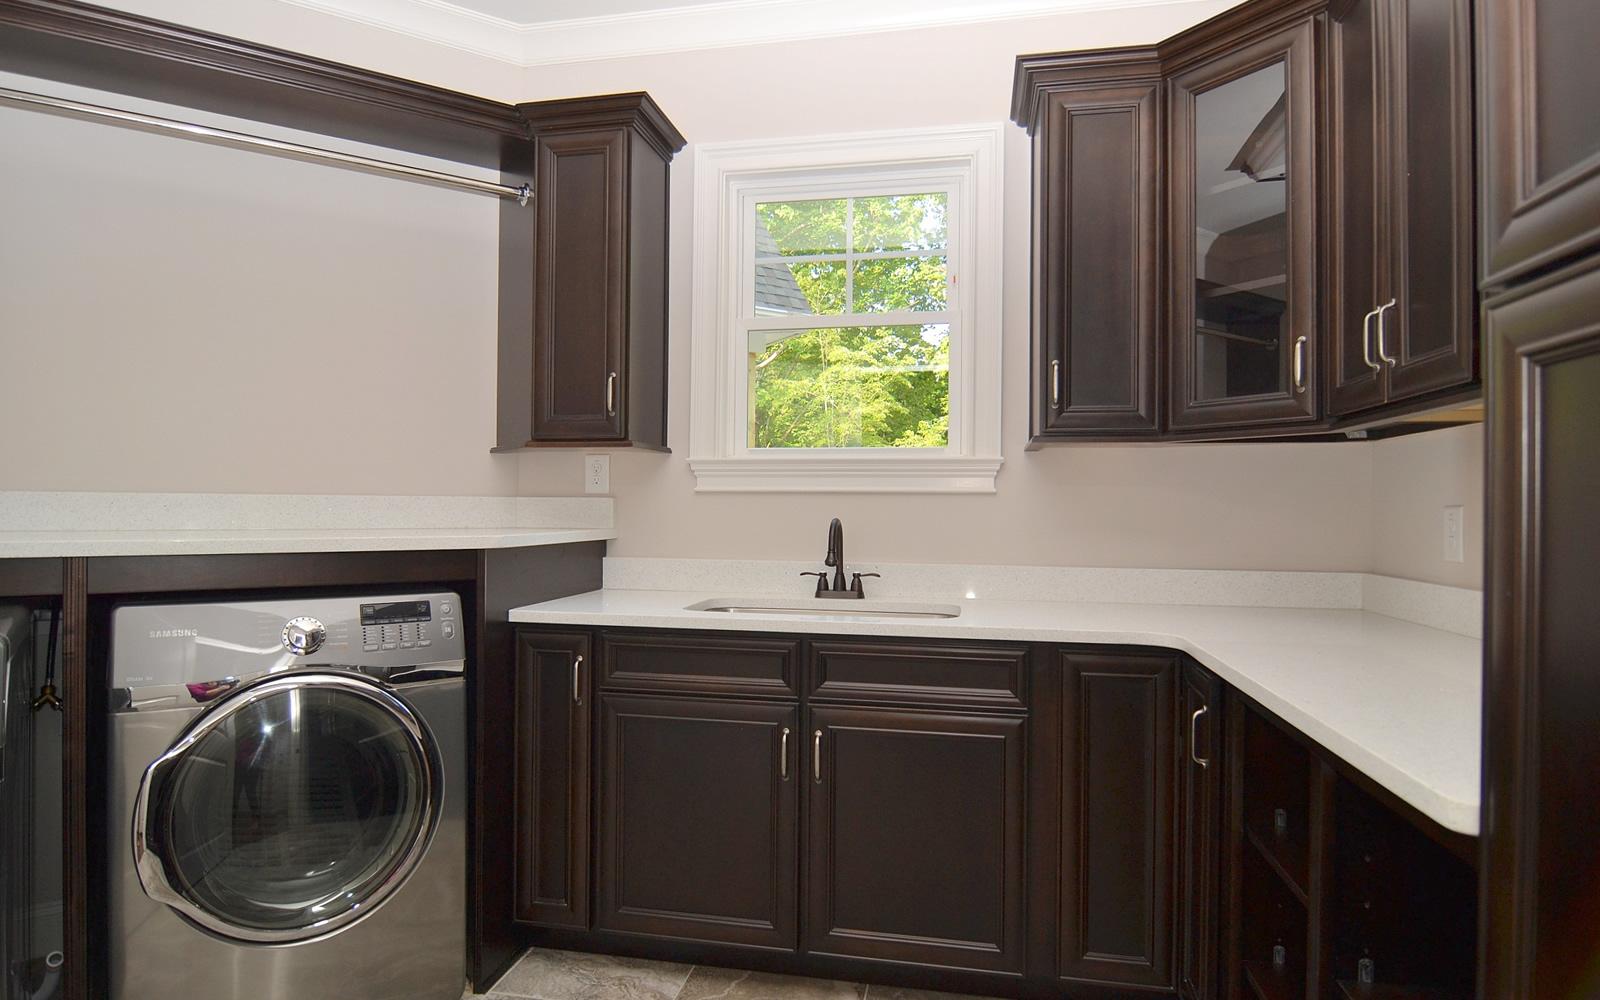 1074 Millstone Lane Laundry